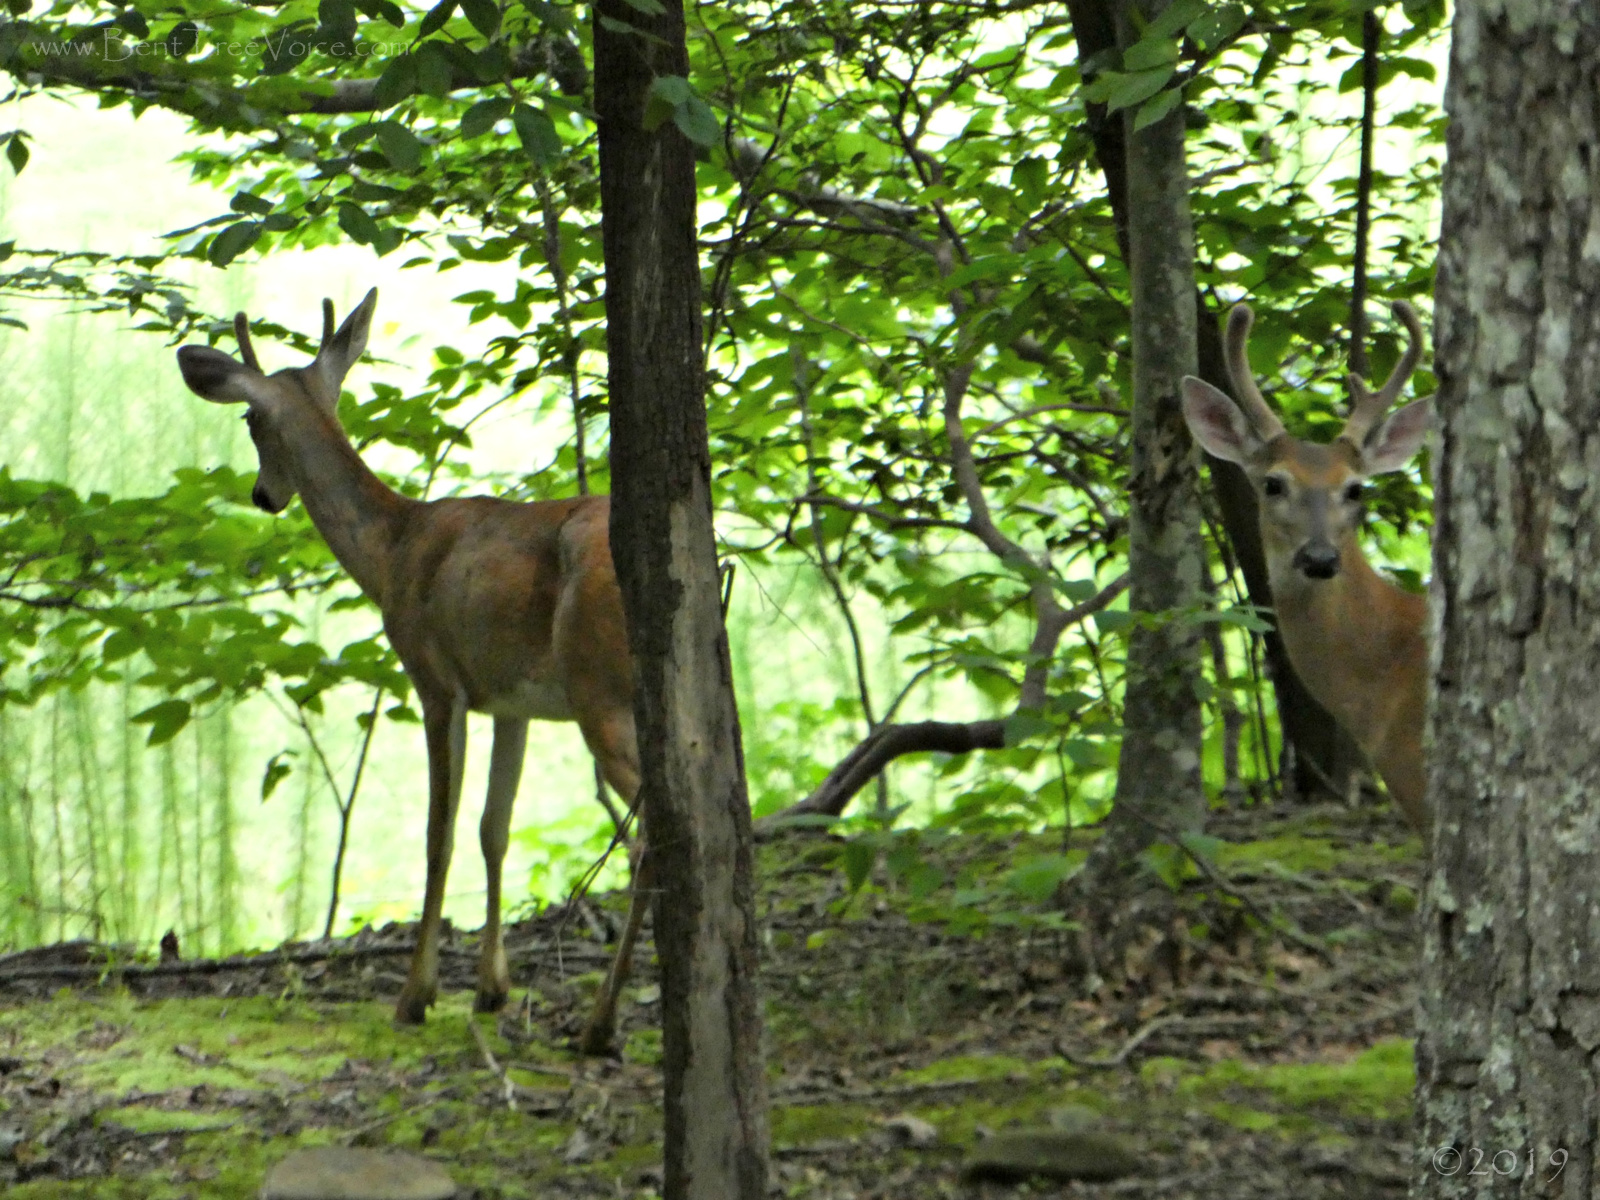 August 10, 2019 - Two Bucks in Bent Tree